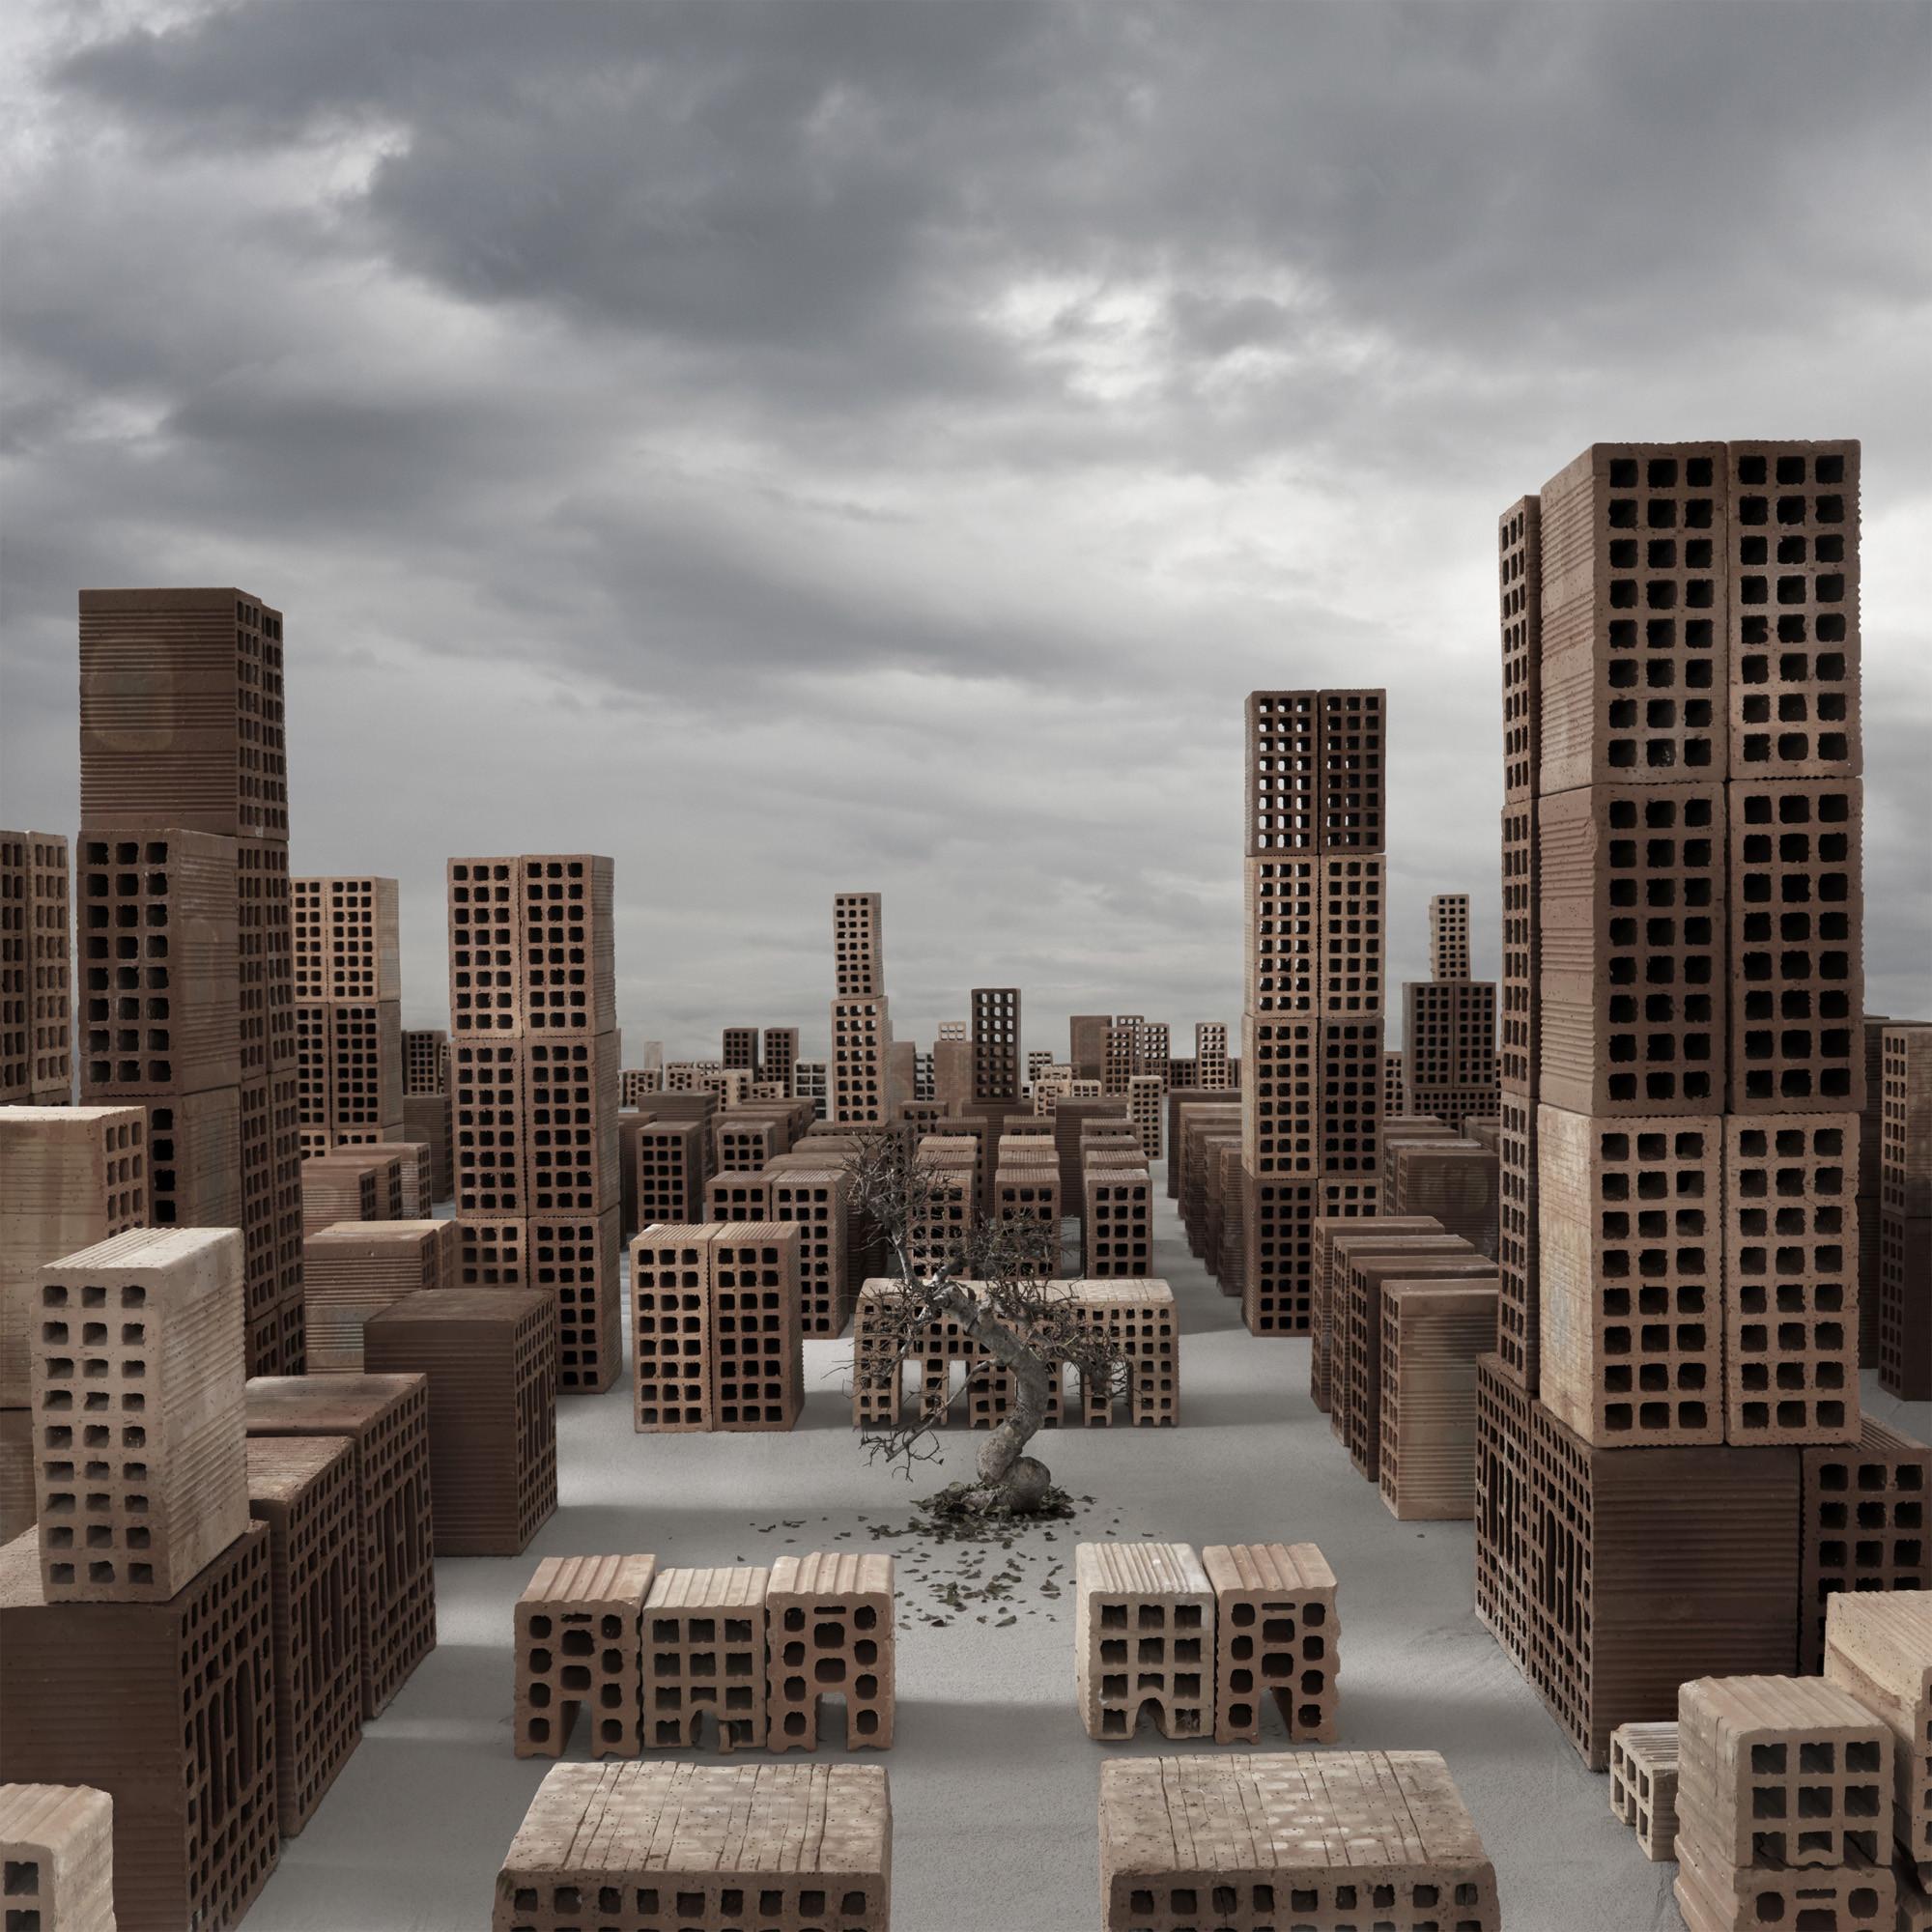 Arte y Arquitectura: Città Minime, ciudades mínimas hechas de ladrillos por Matteo Mezzadri , © Matteo Mezzadri